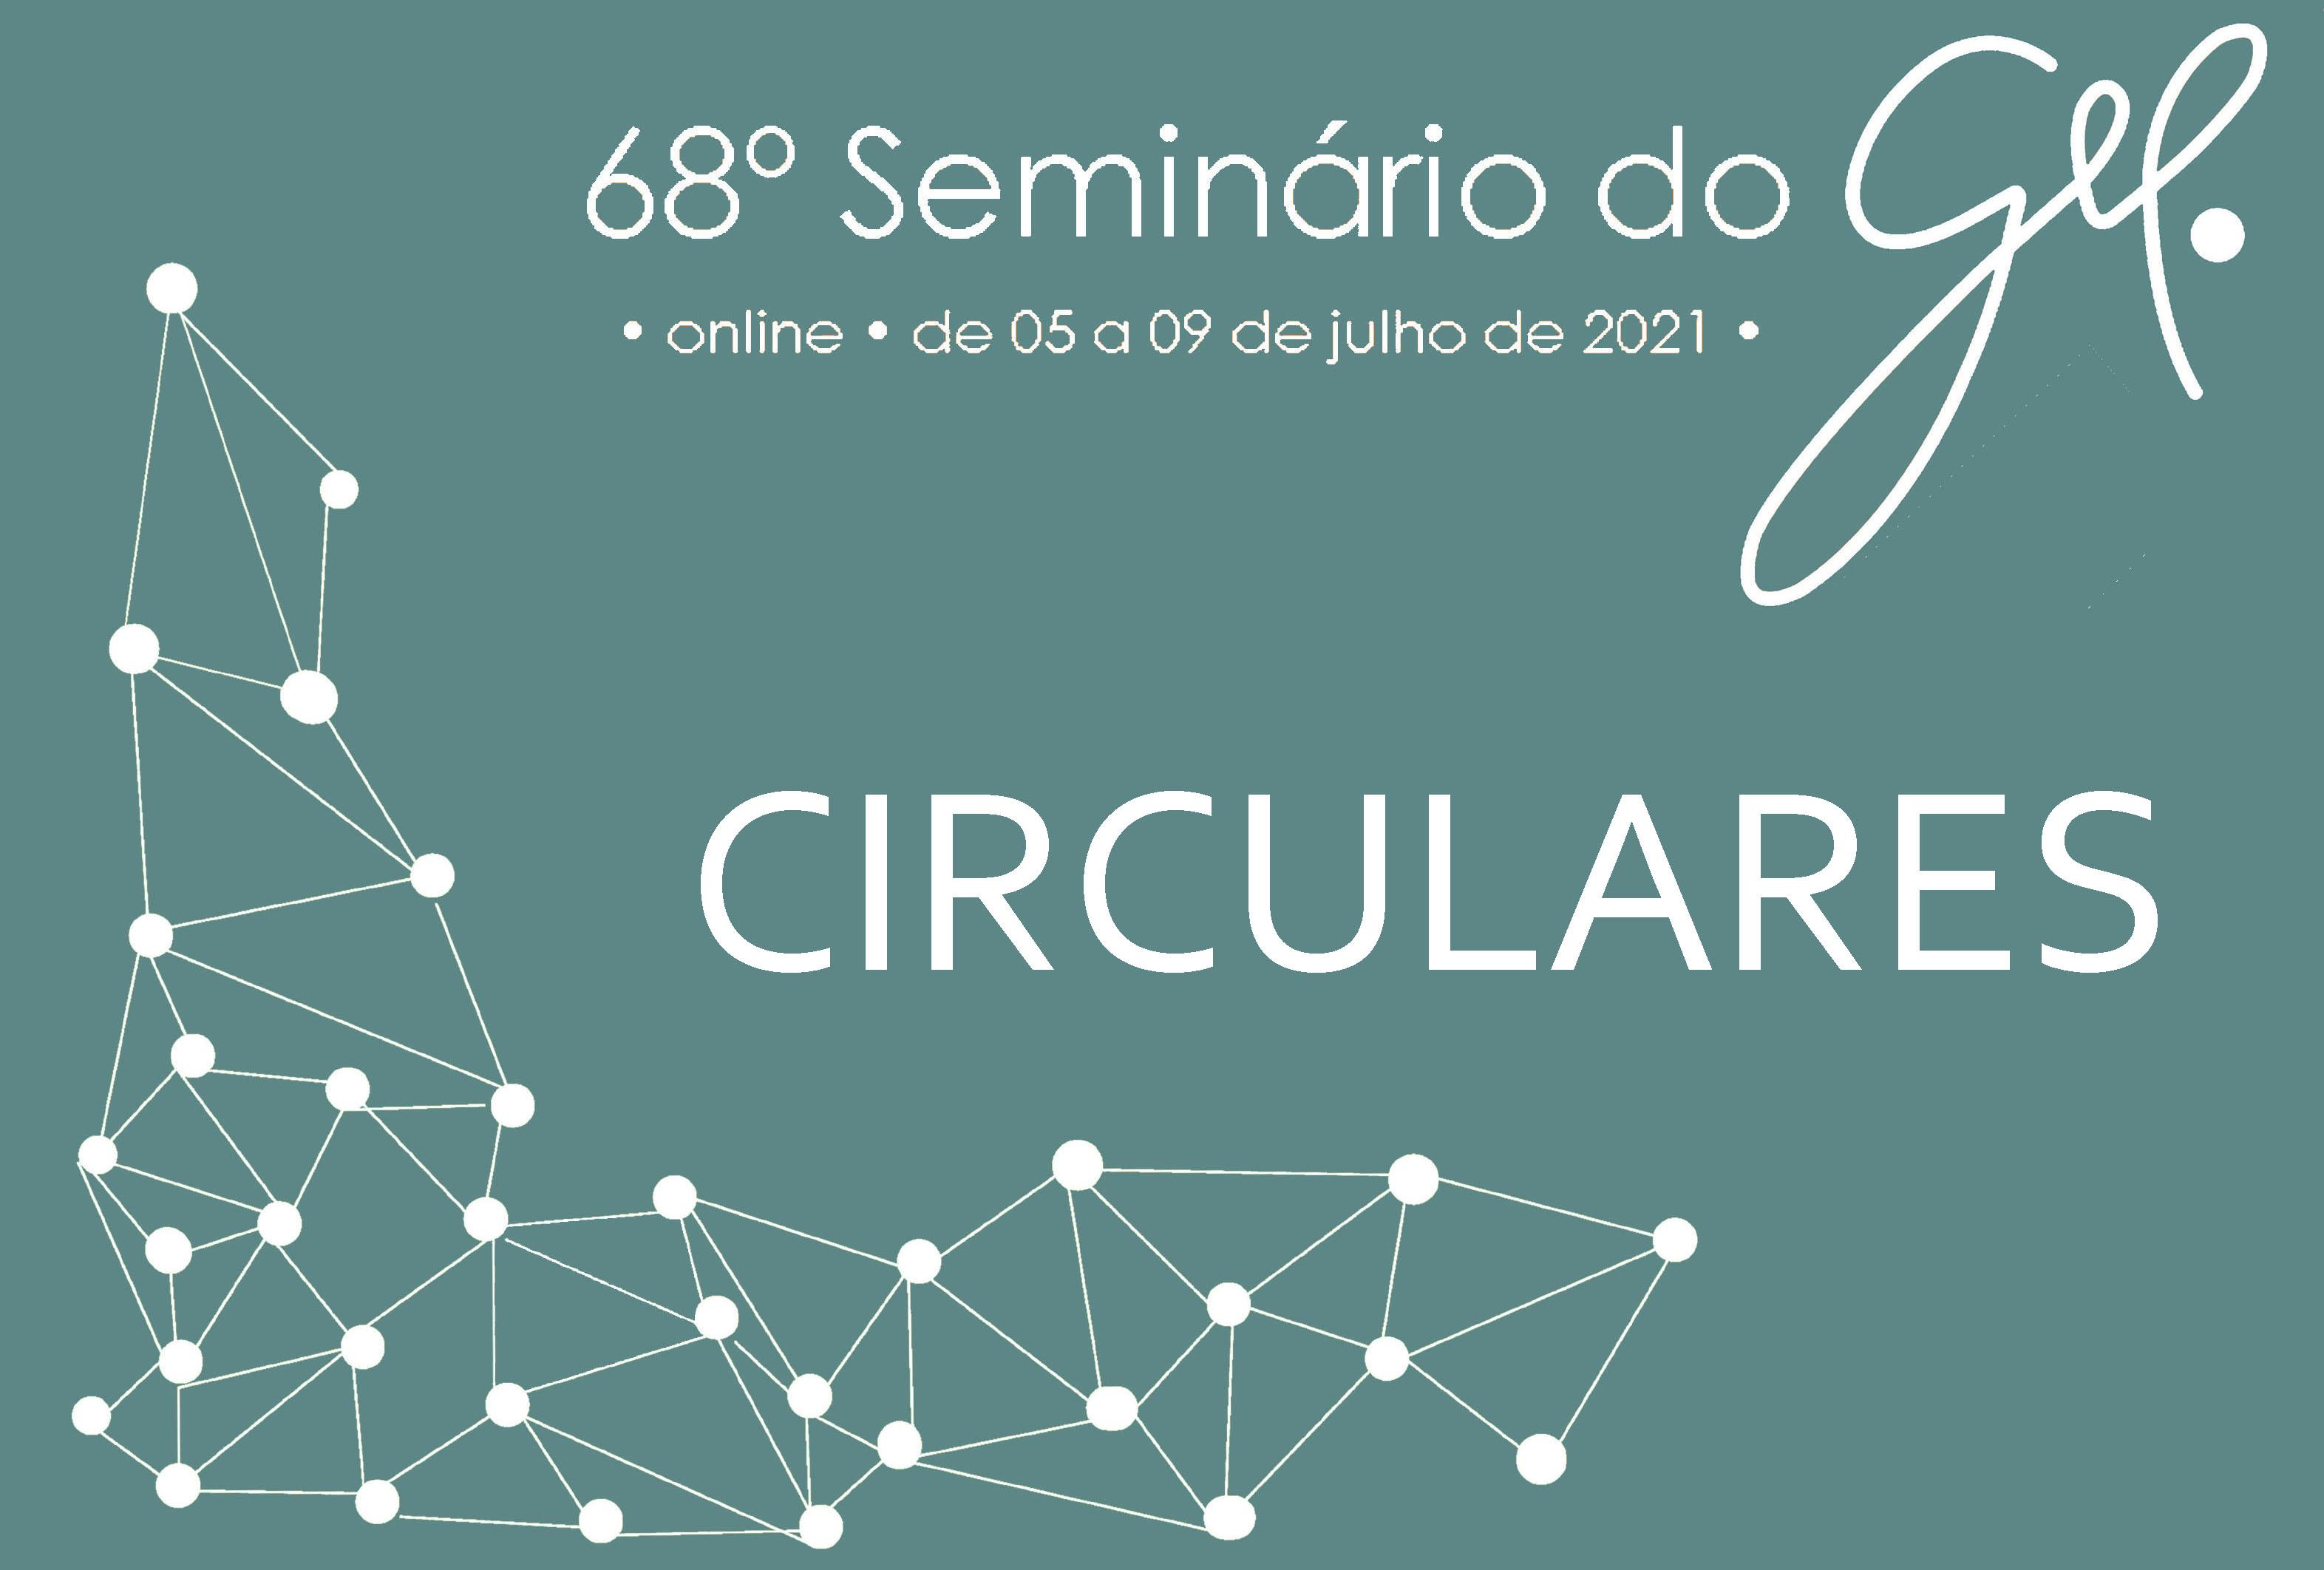 Circulares (2021)